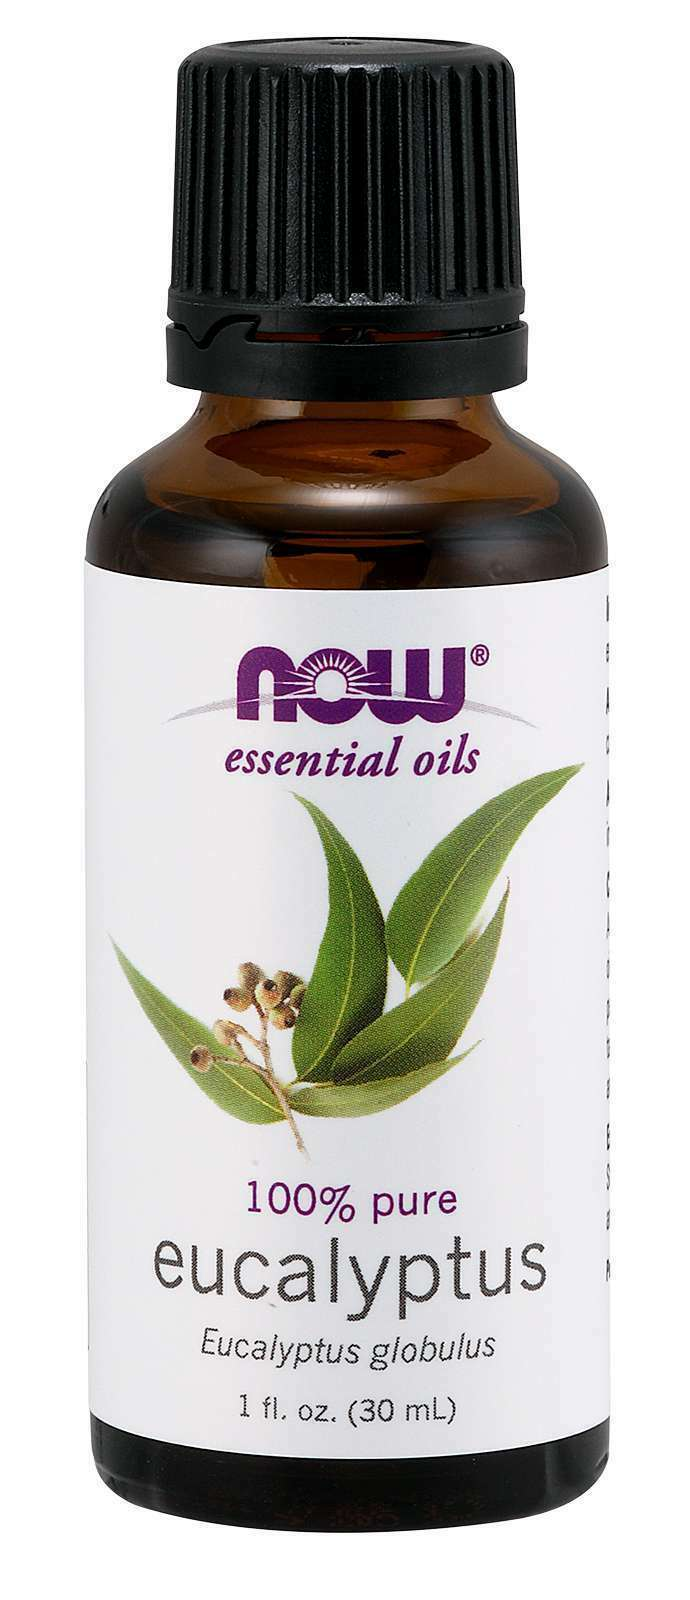 Now Foods Eucalyptus Oil Clarifying Aromatherapy Scent, Steam Distilled 1oz/30ml - $6.29